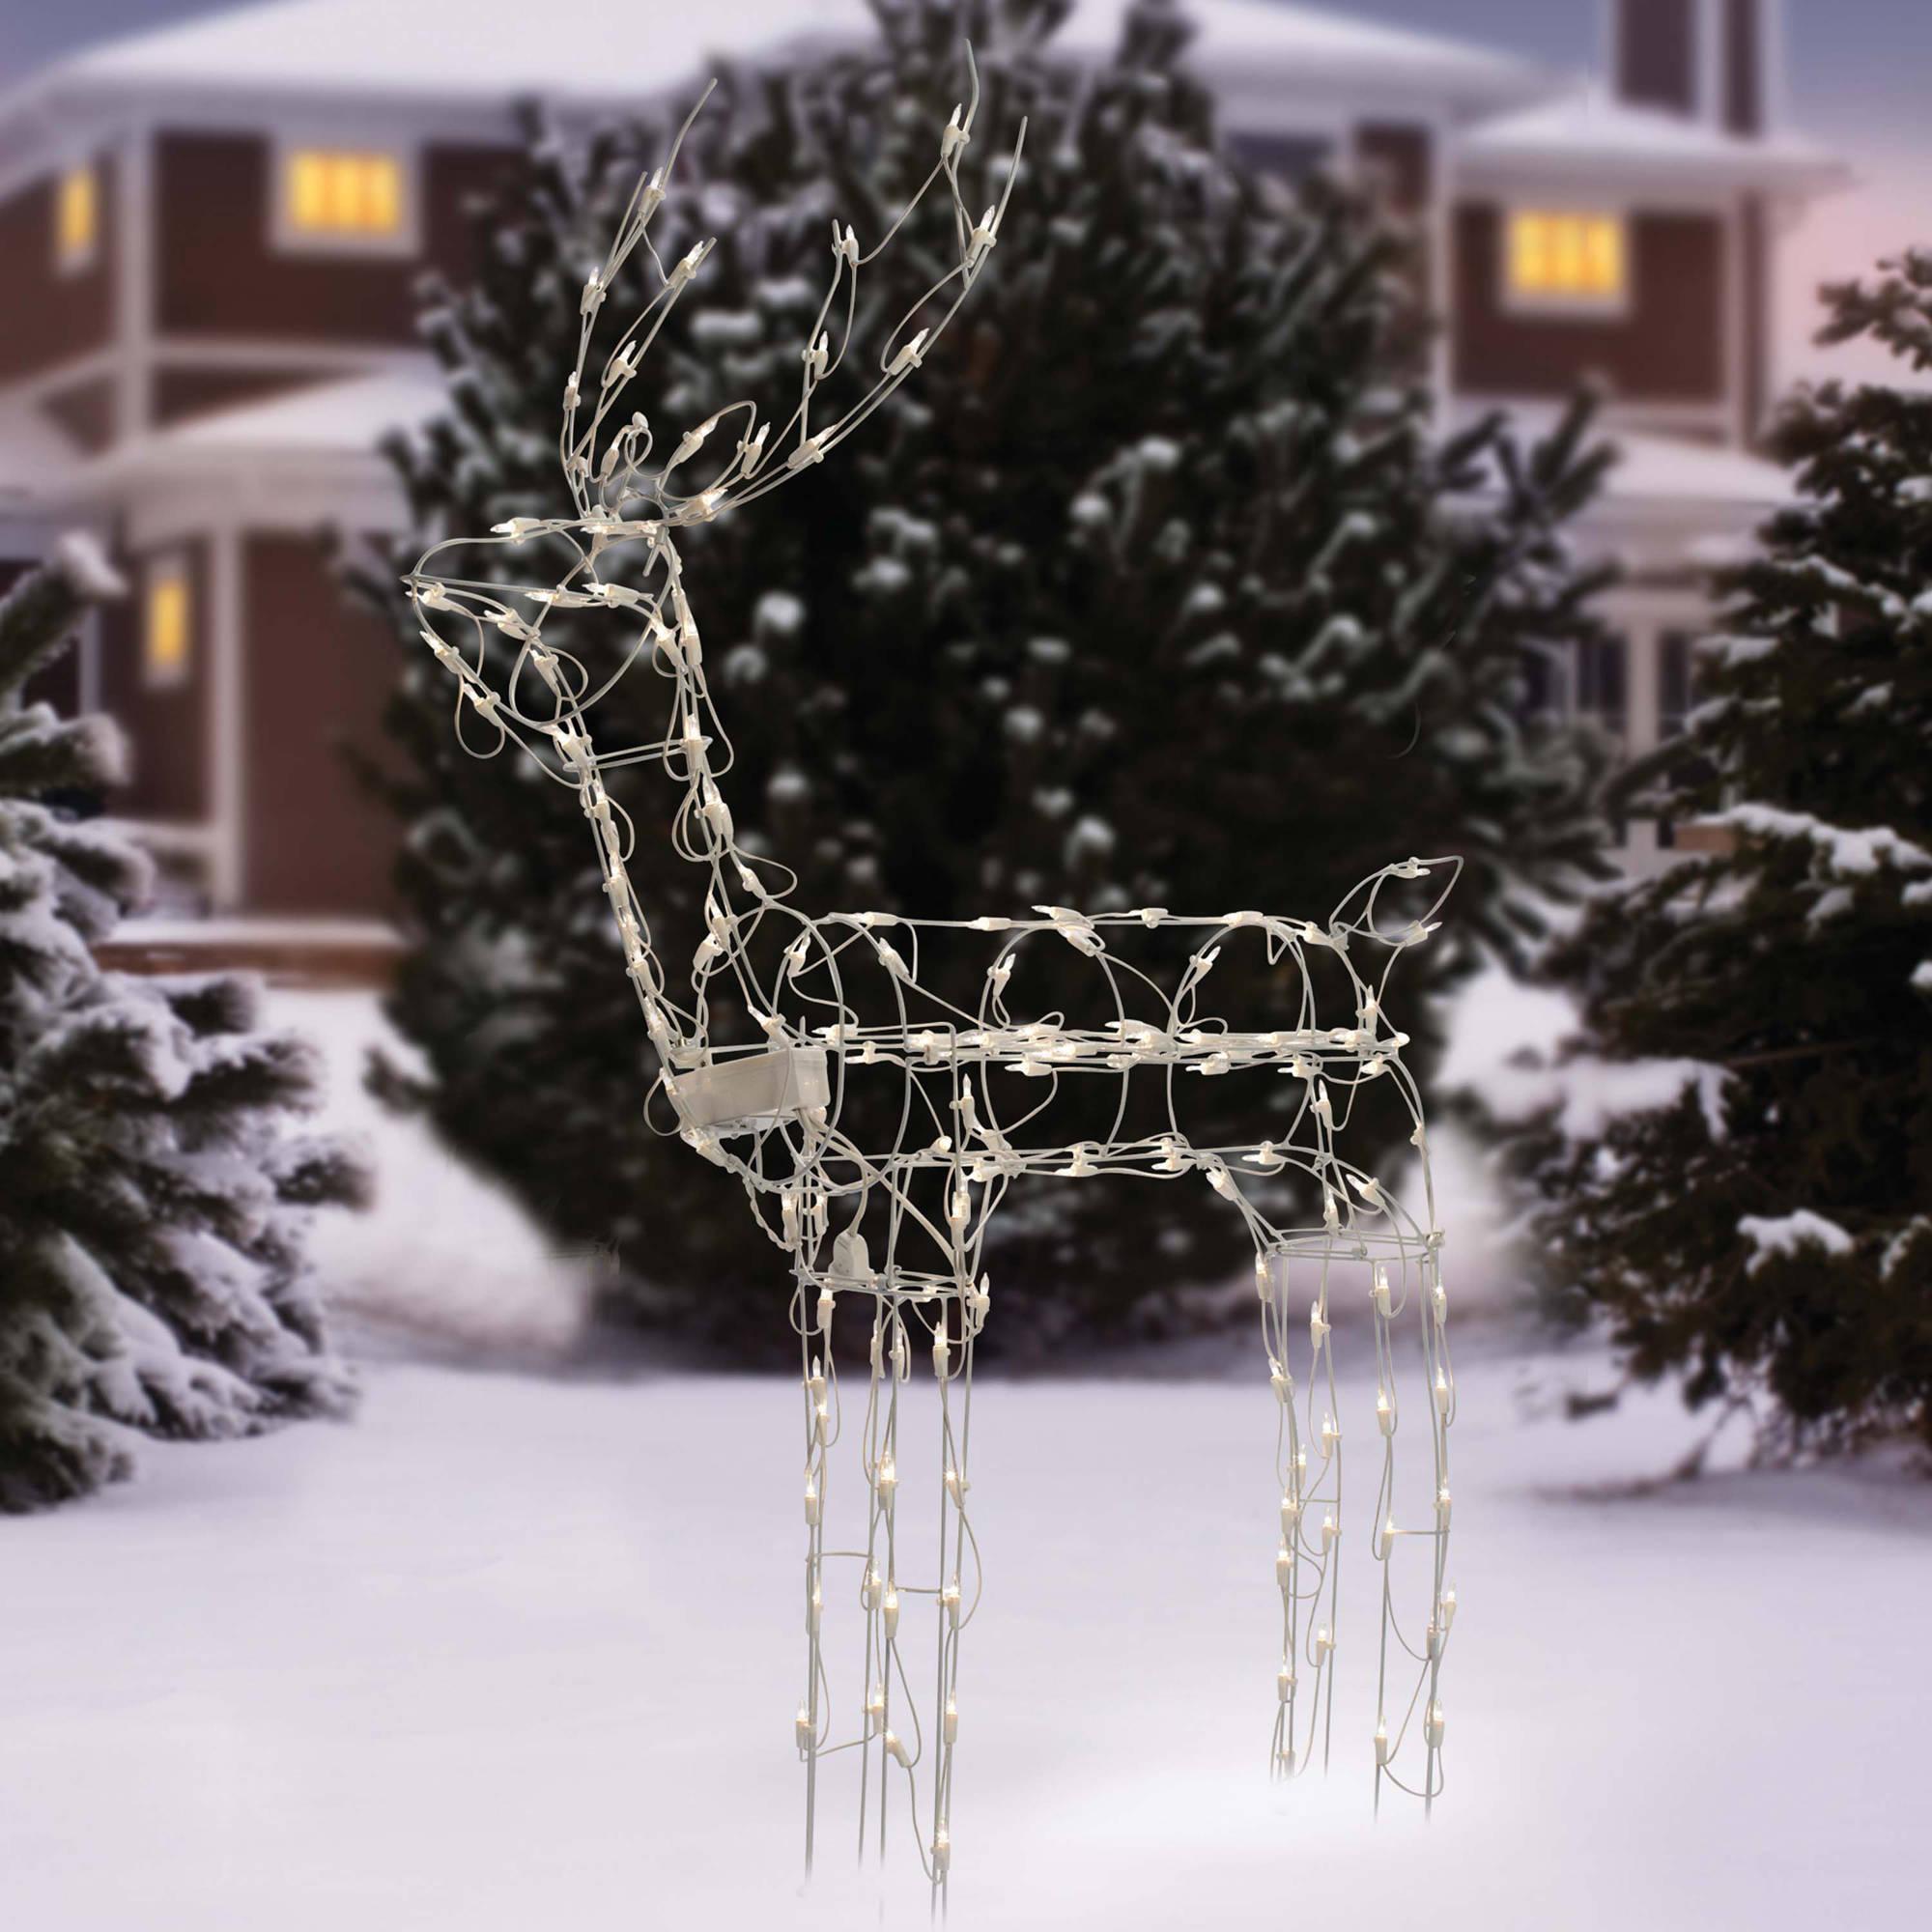 "Holiday Time 48"" Tall Animated Standing Buck Light Sculpture Christmas Decor"